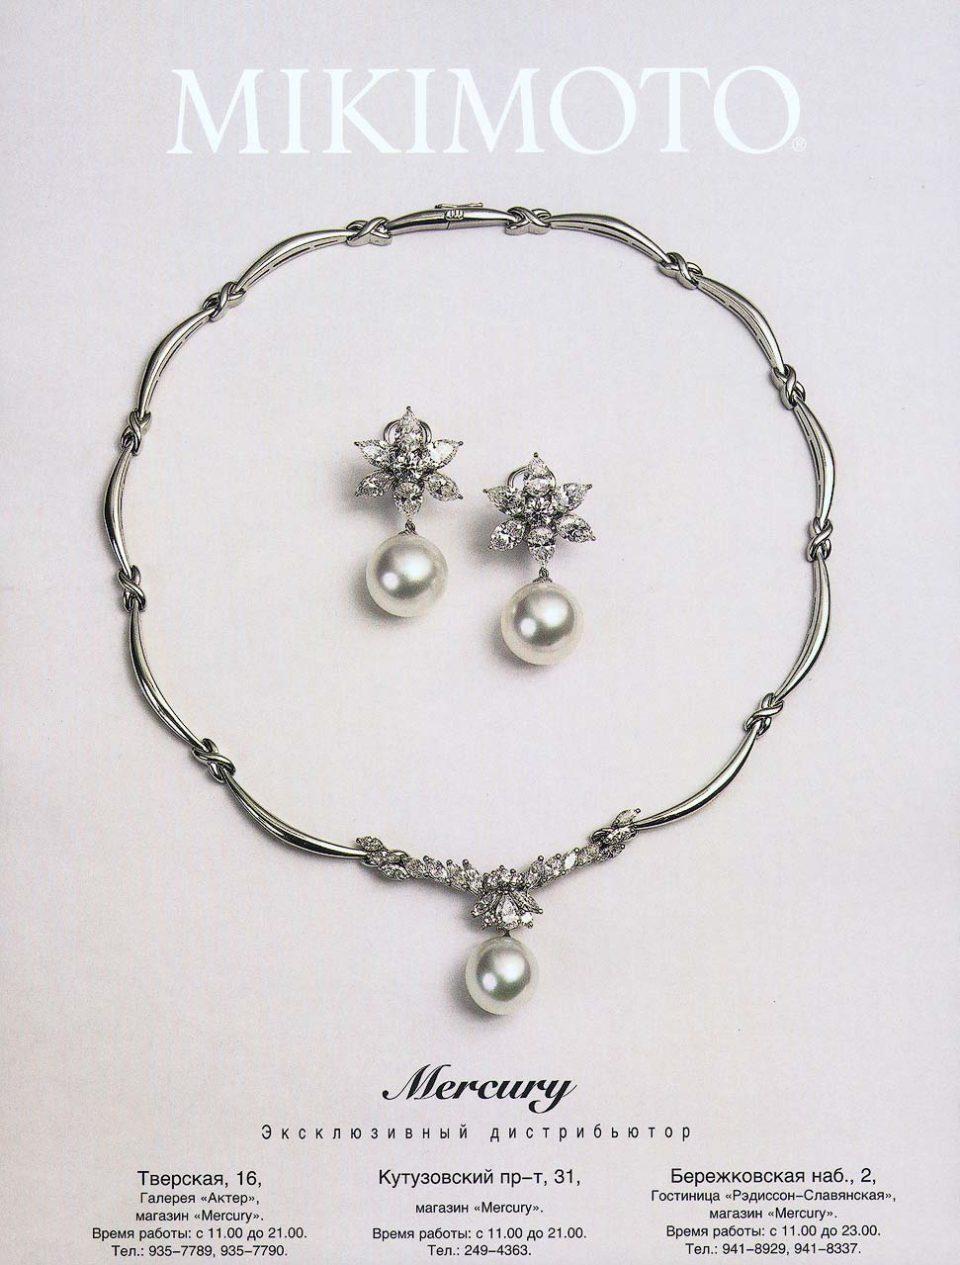 Жемчуг Mikimoto для Mercury